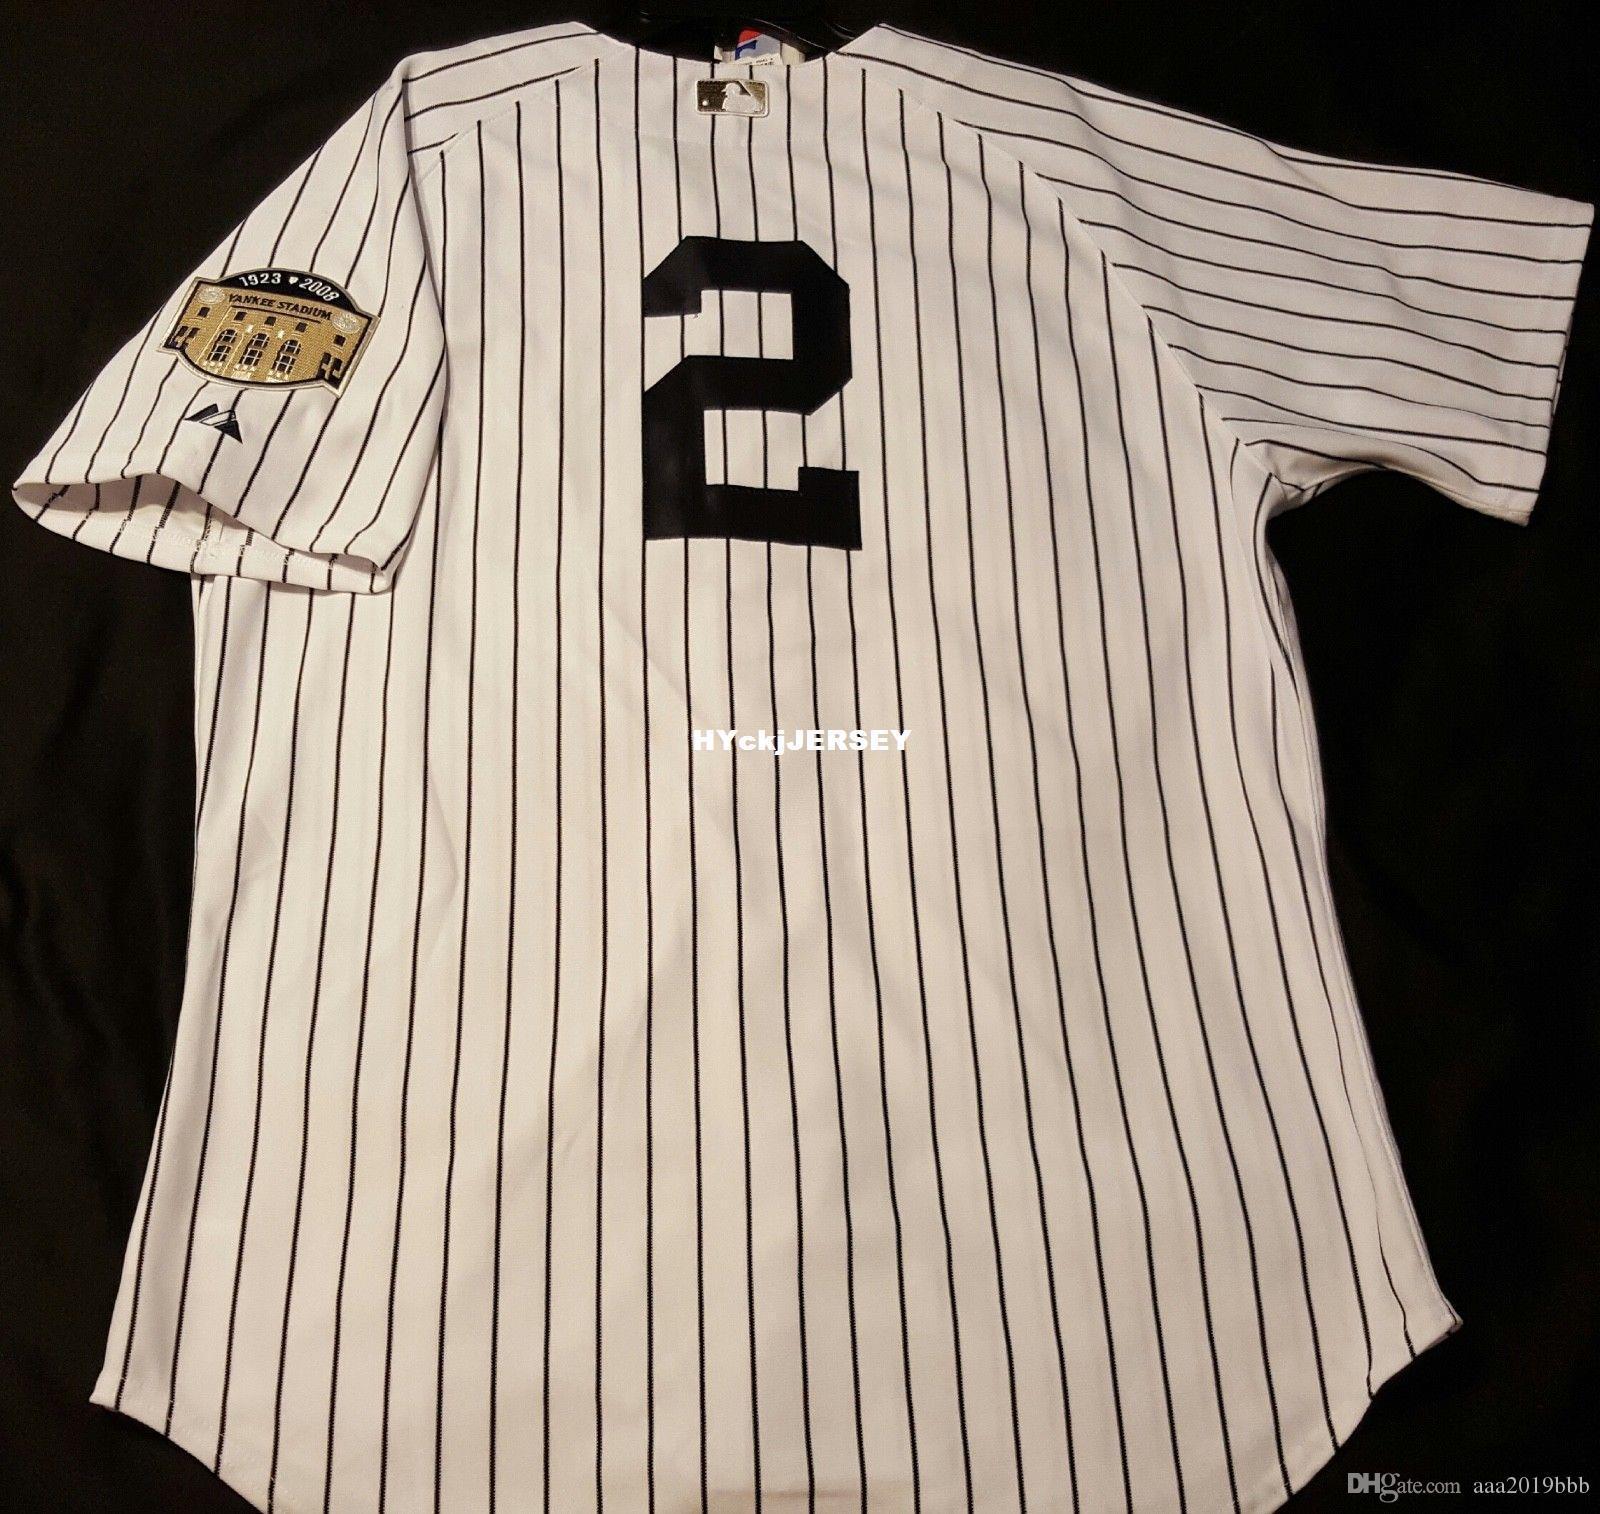 new styles b9d47 4dd85 Cheap Majestic NEW YORK DEREK JETER #2 ON FIELD Jersey Mens Stitched  Wholesale Big And Tall SIZE XS-6XL baseball jerseys